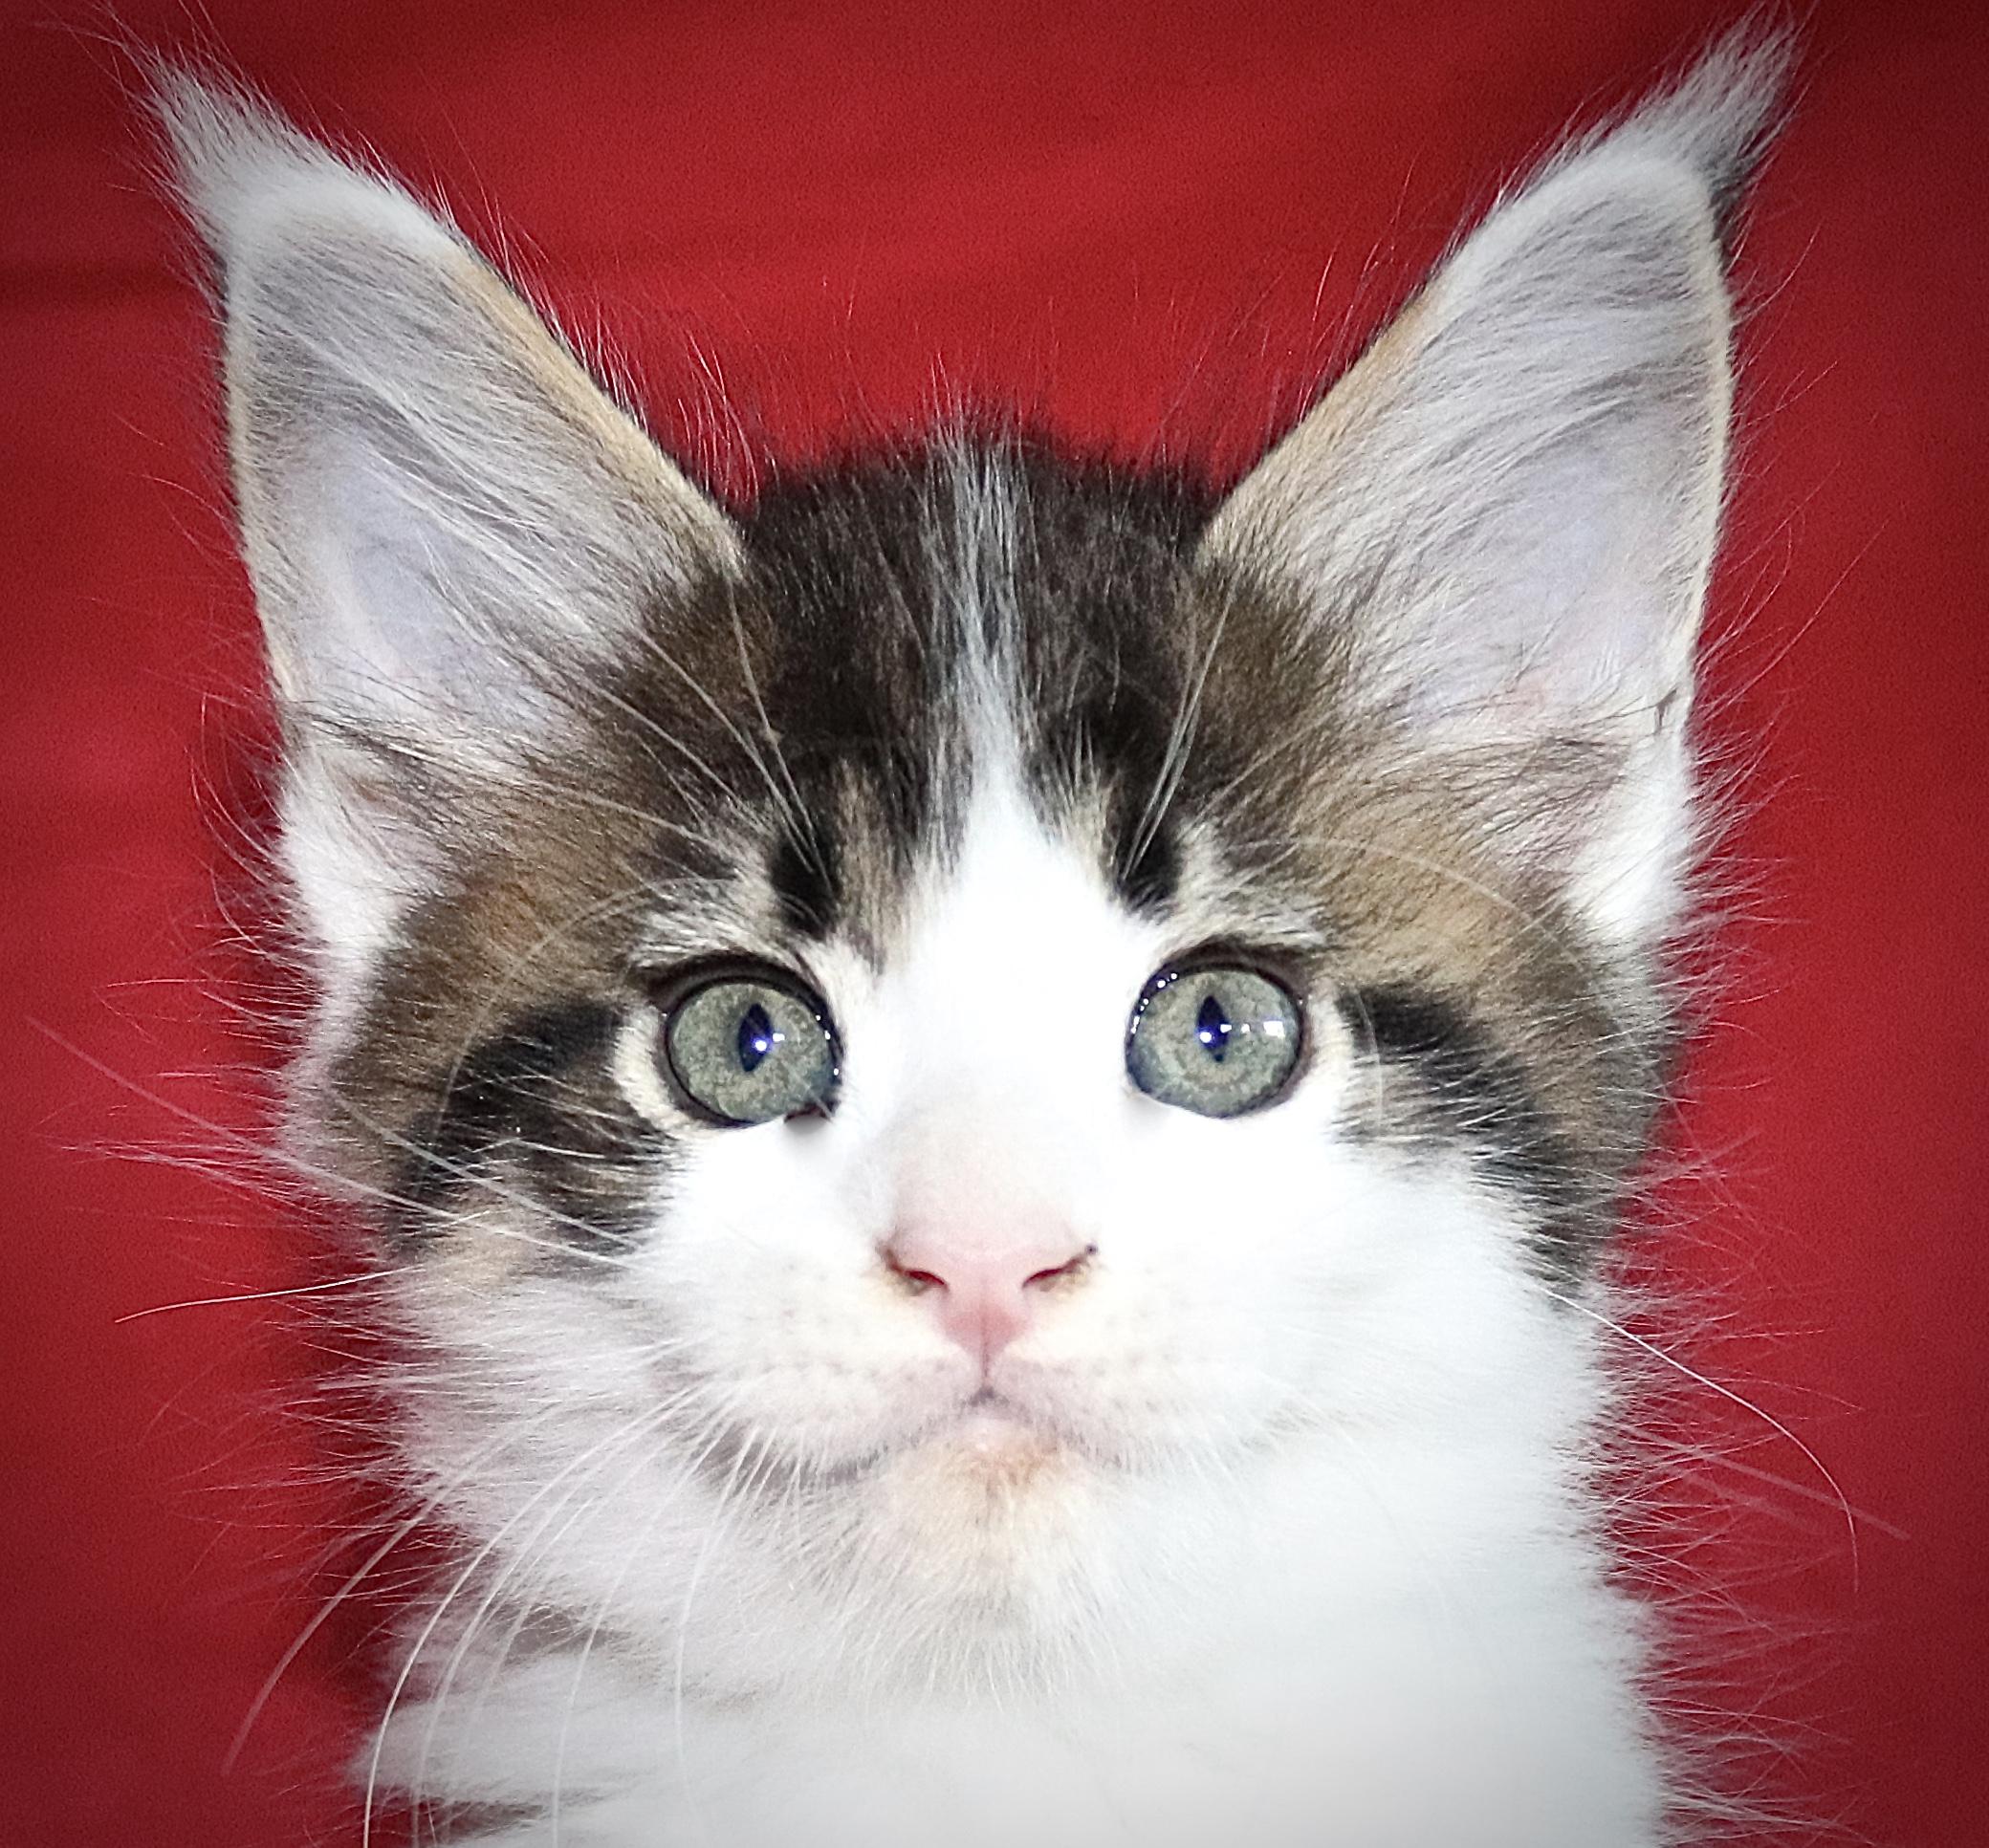 kočka VRH I: IKARUS UNO VON ERILLIAN*CZ